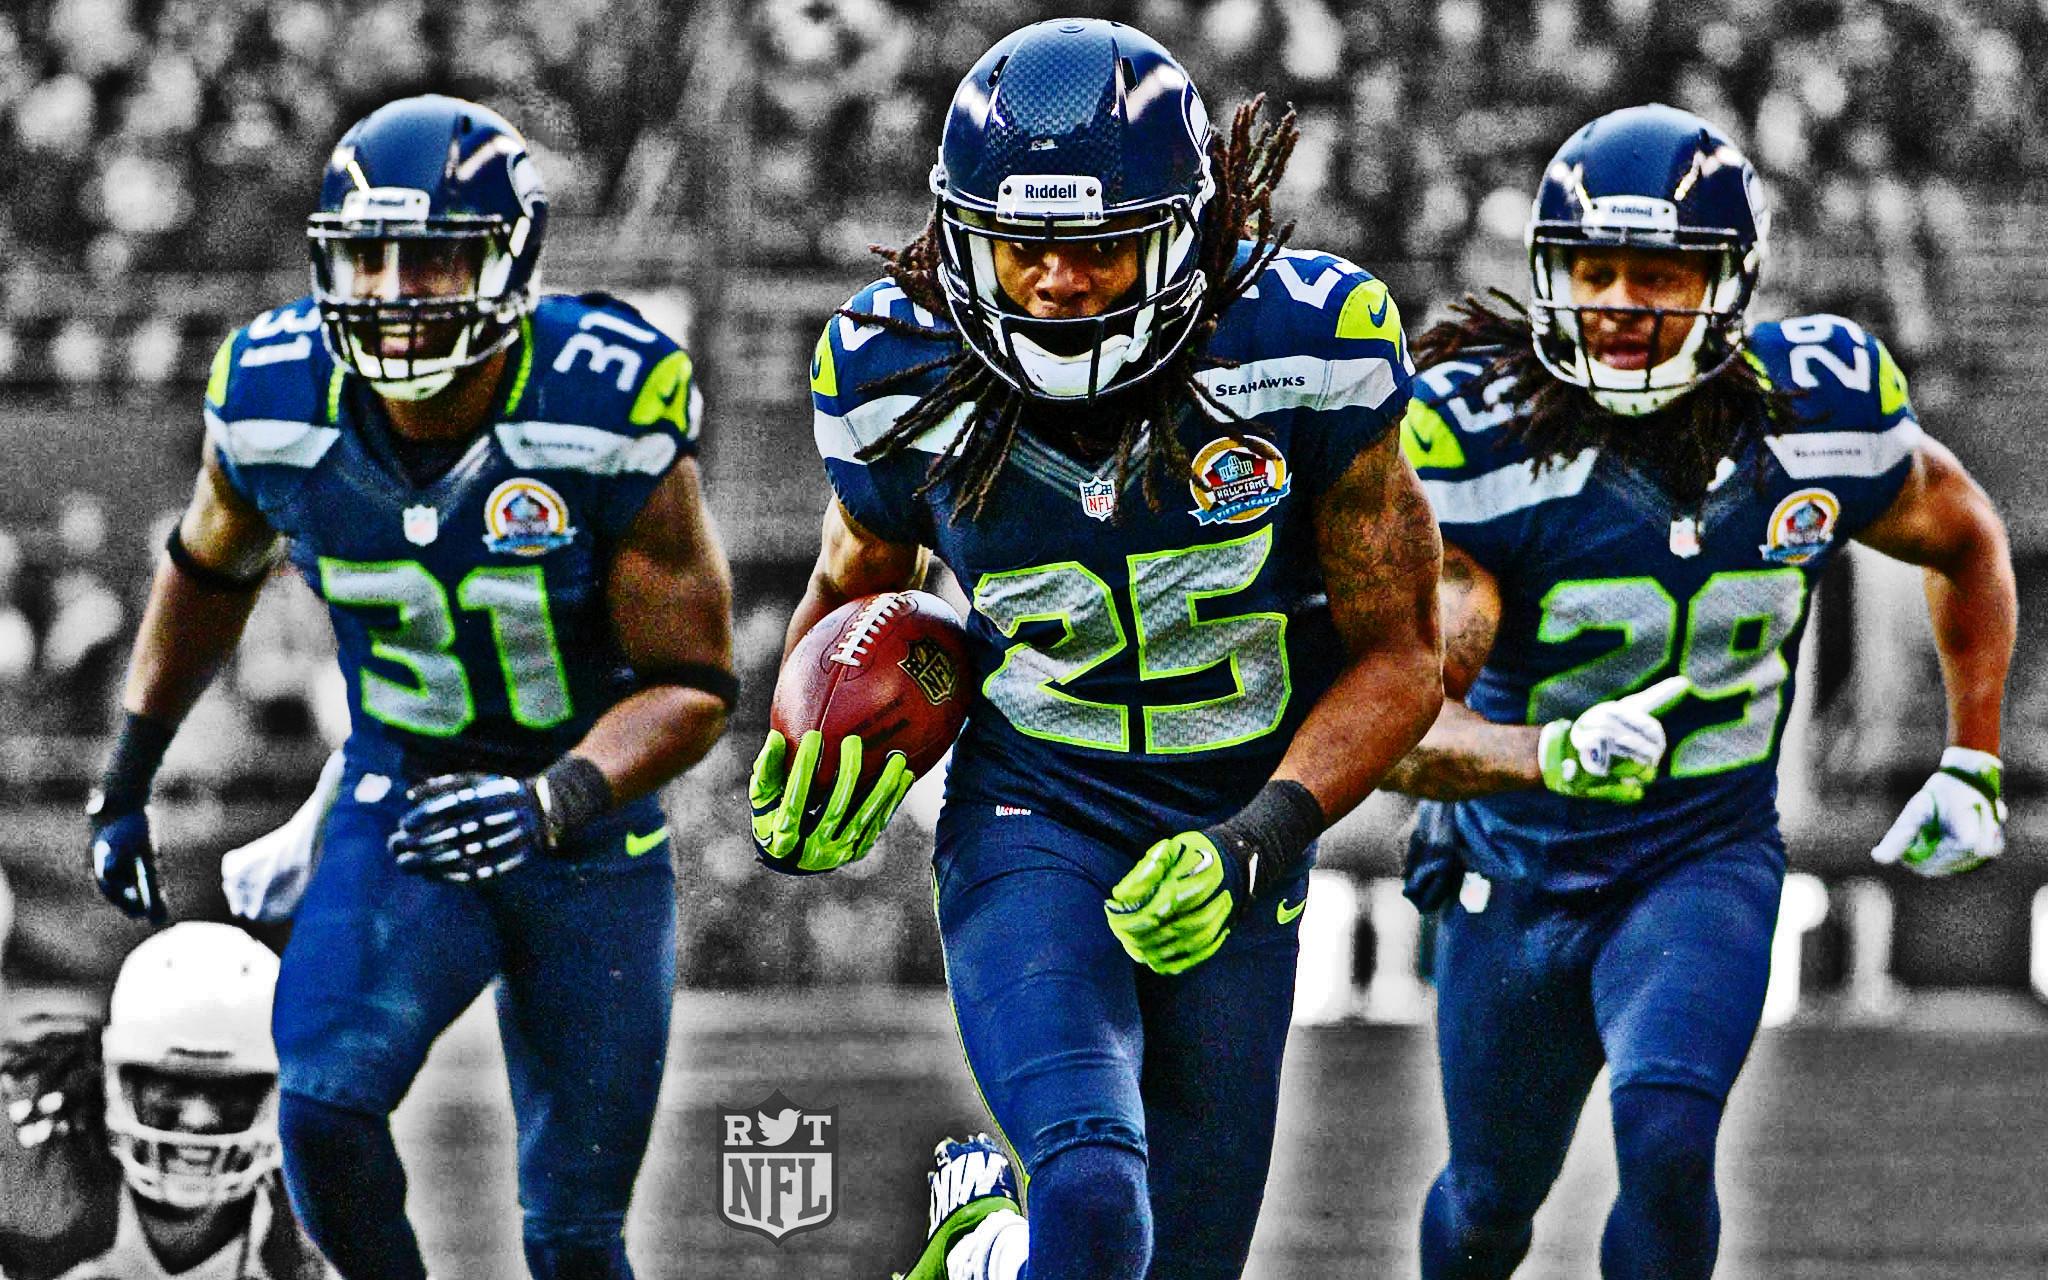 NFL hd wallpapers ›› Page 0 | Cool Wallpaper HDwallpaperfun.com